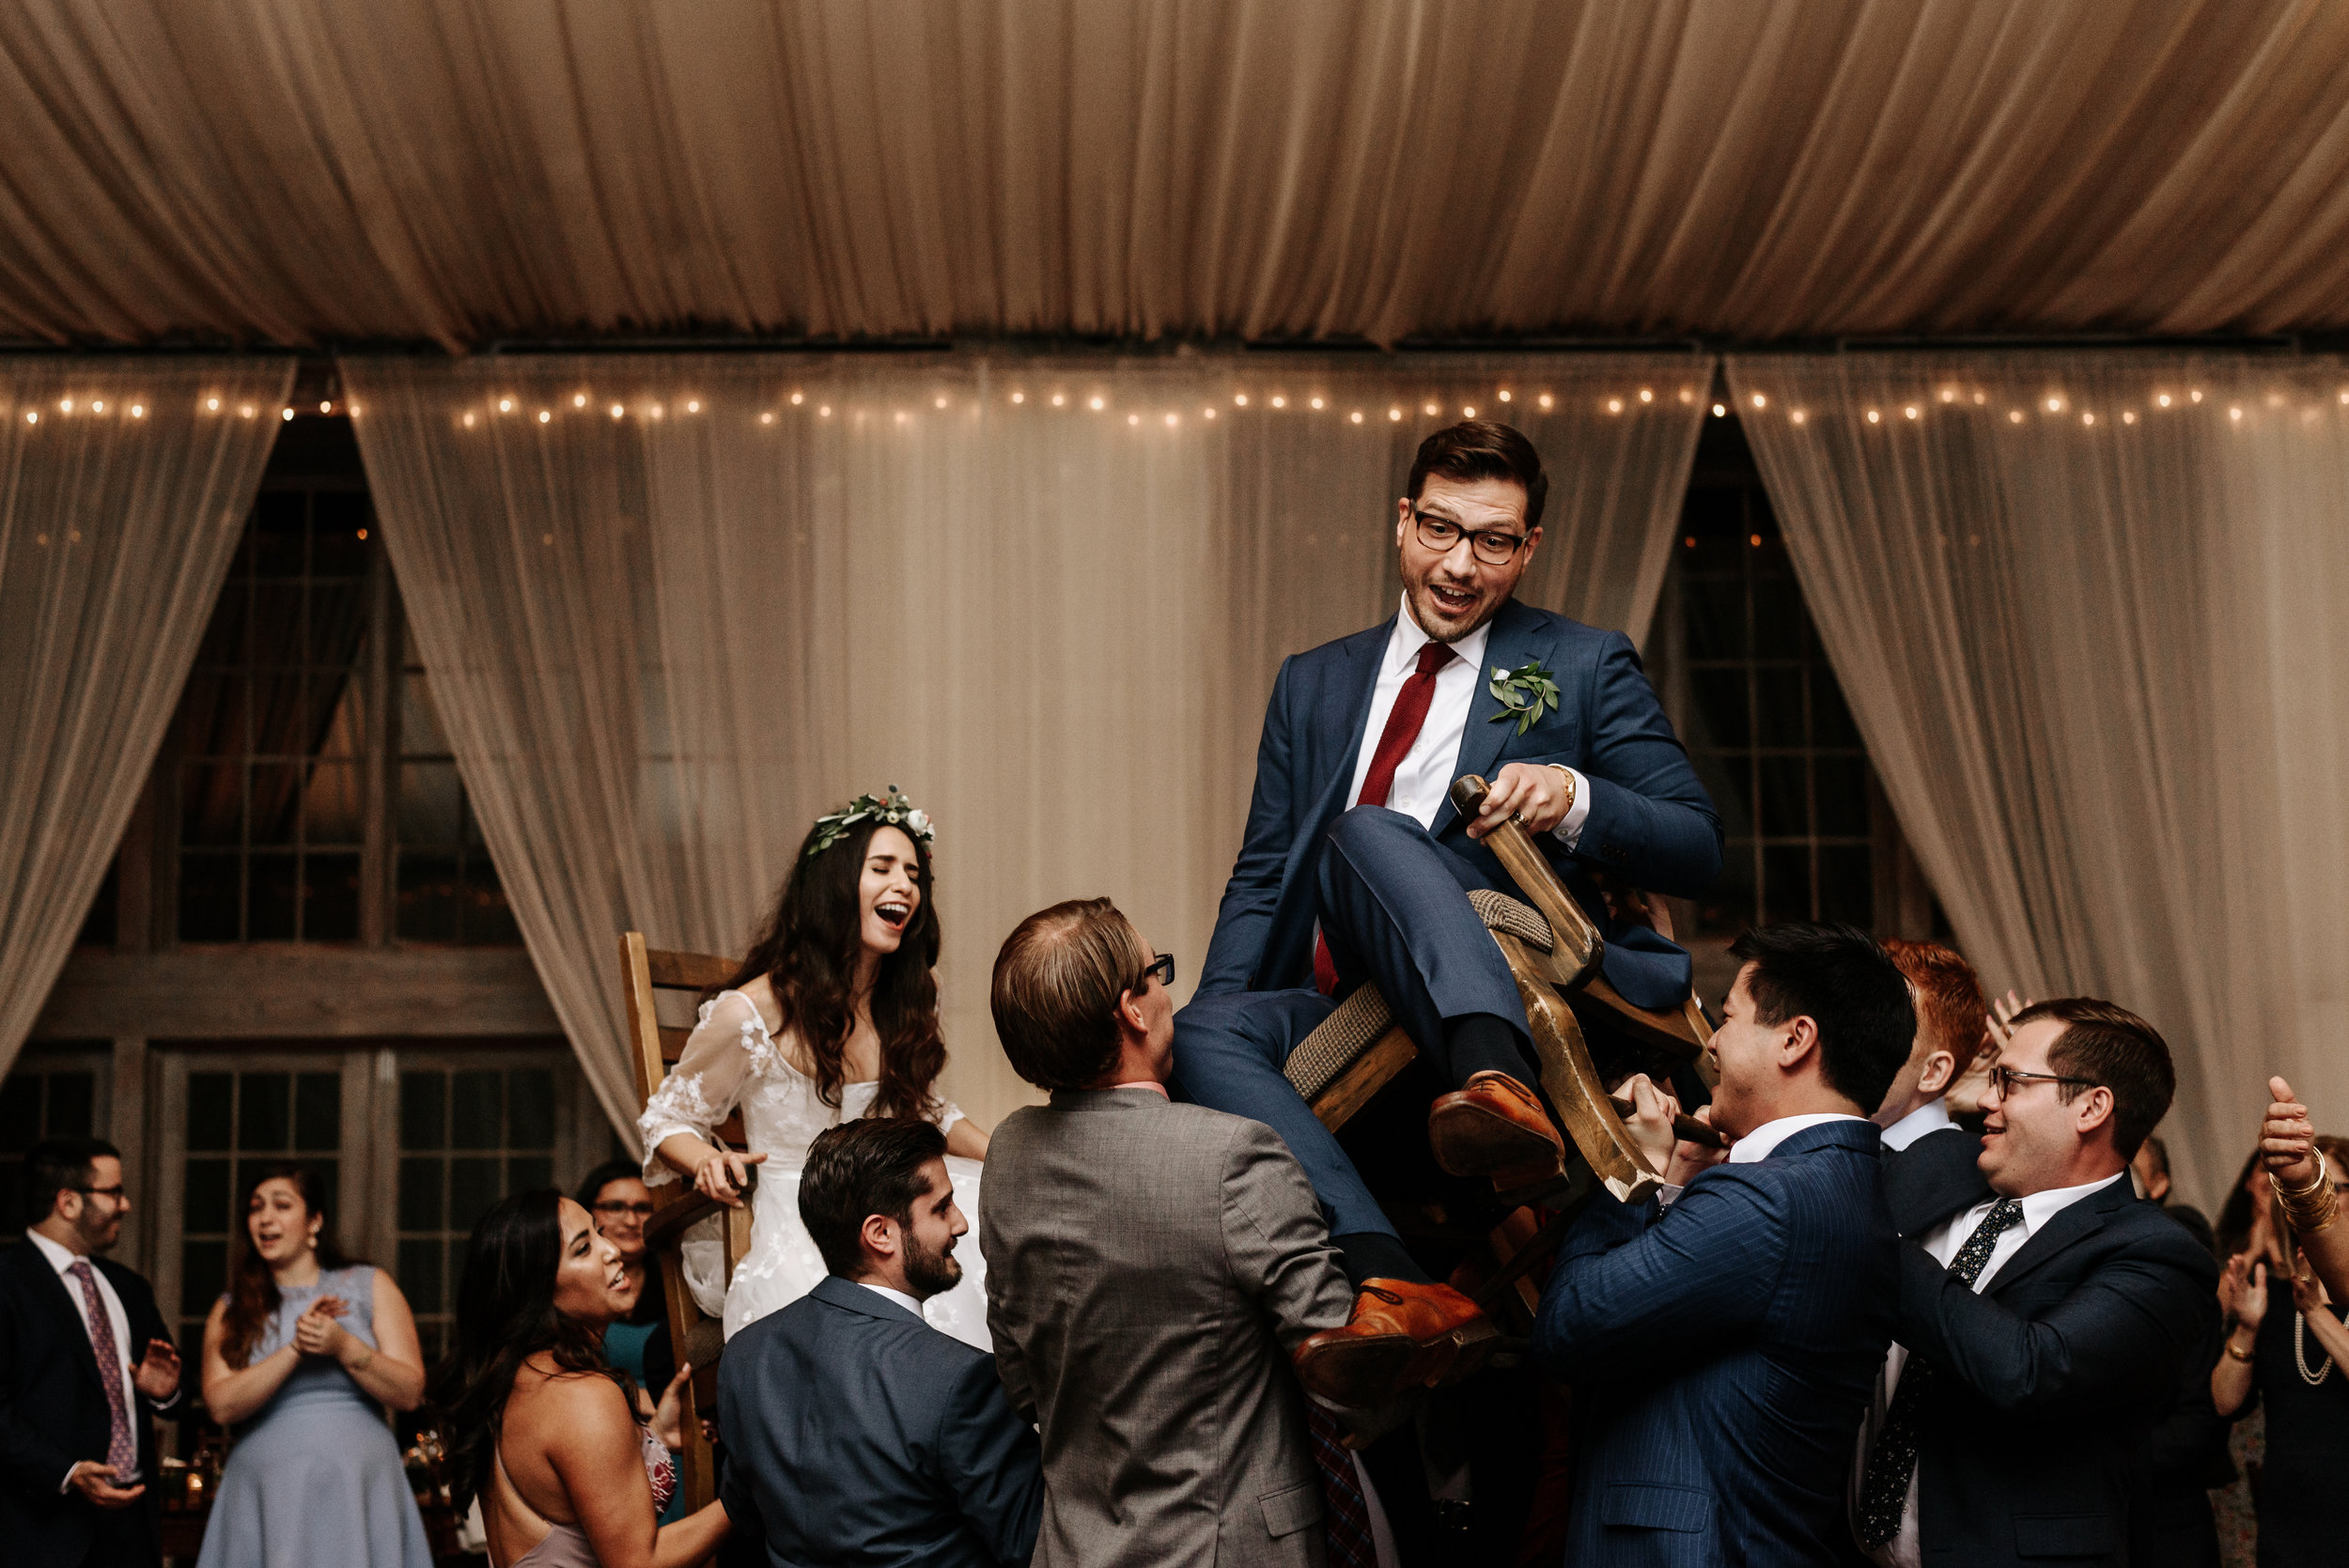 Veritas-Vineyards-and-Winery-Wedding-Photography-Afton-Virginia-Yasmin-Seth-Photography-by-V-3274.jpg